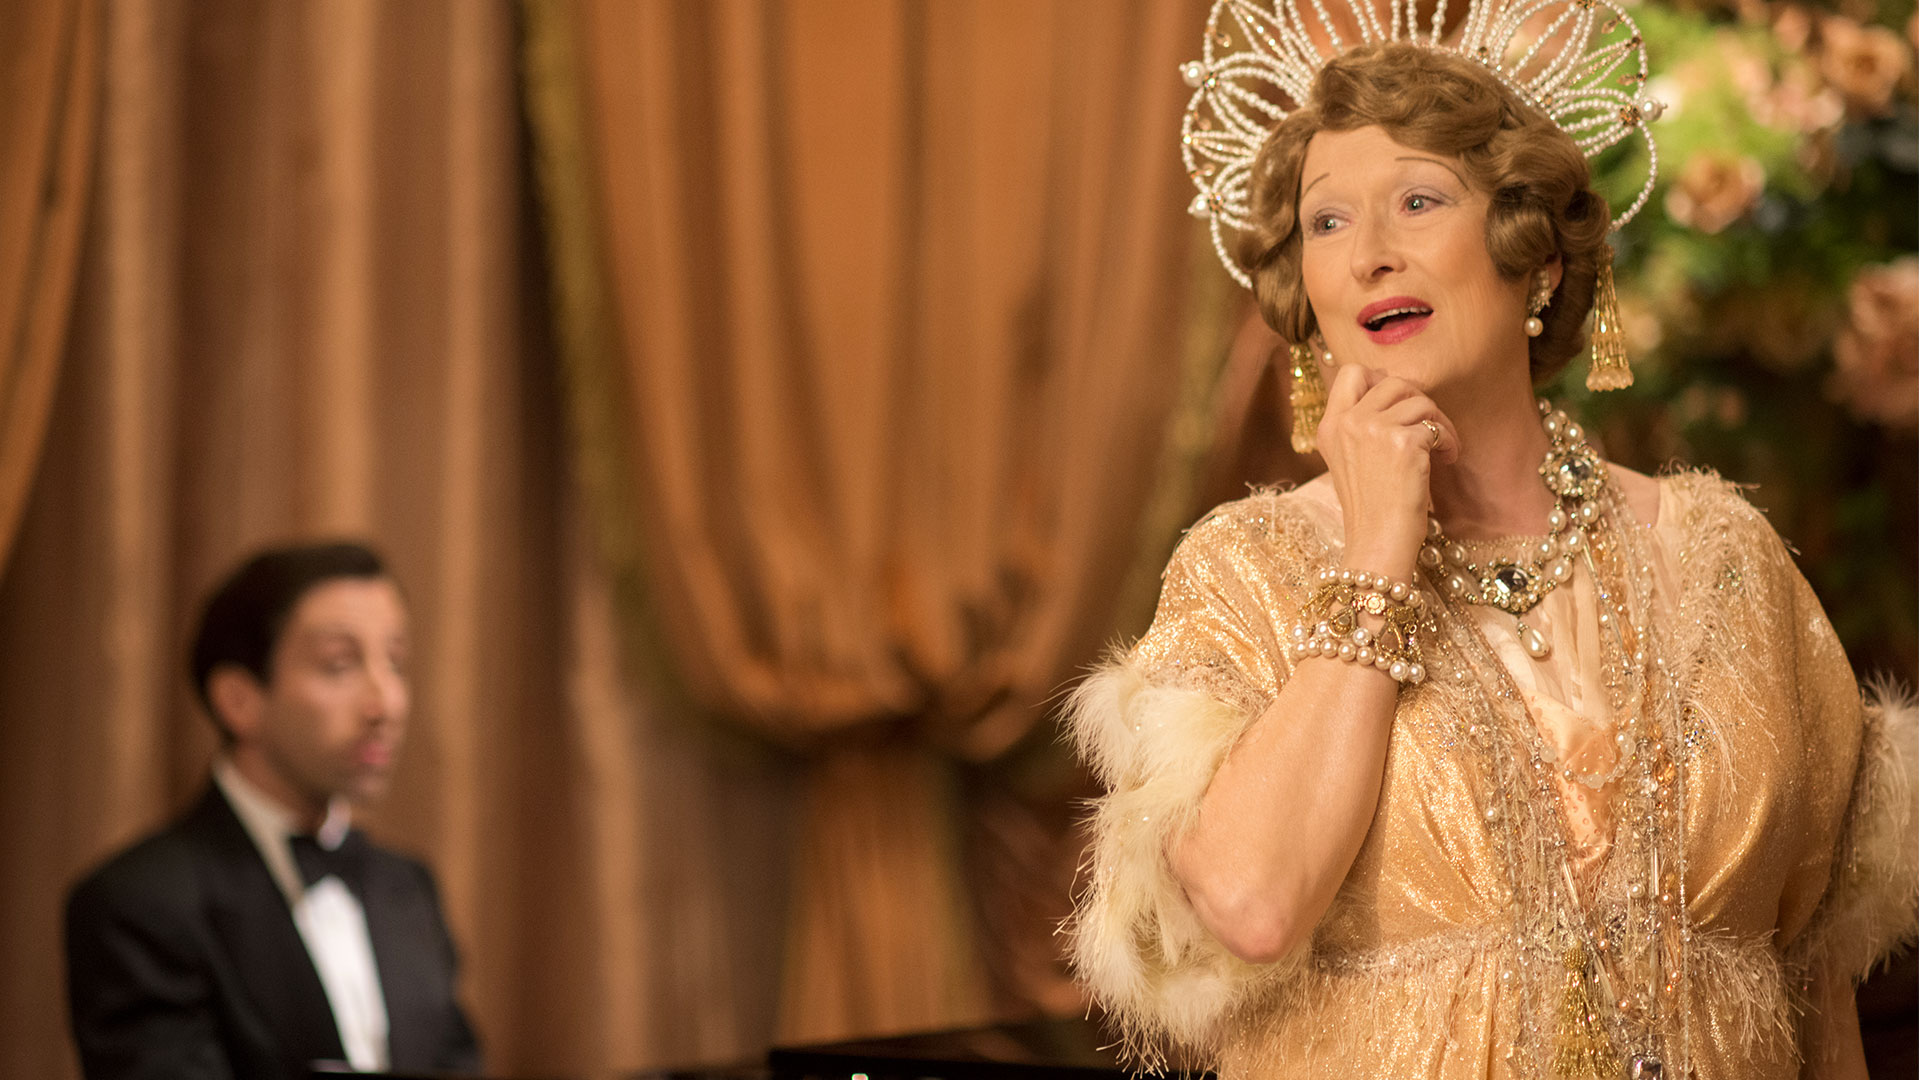 Meryl Streep's Best Work: Florence Foster Jenkins